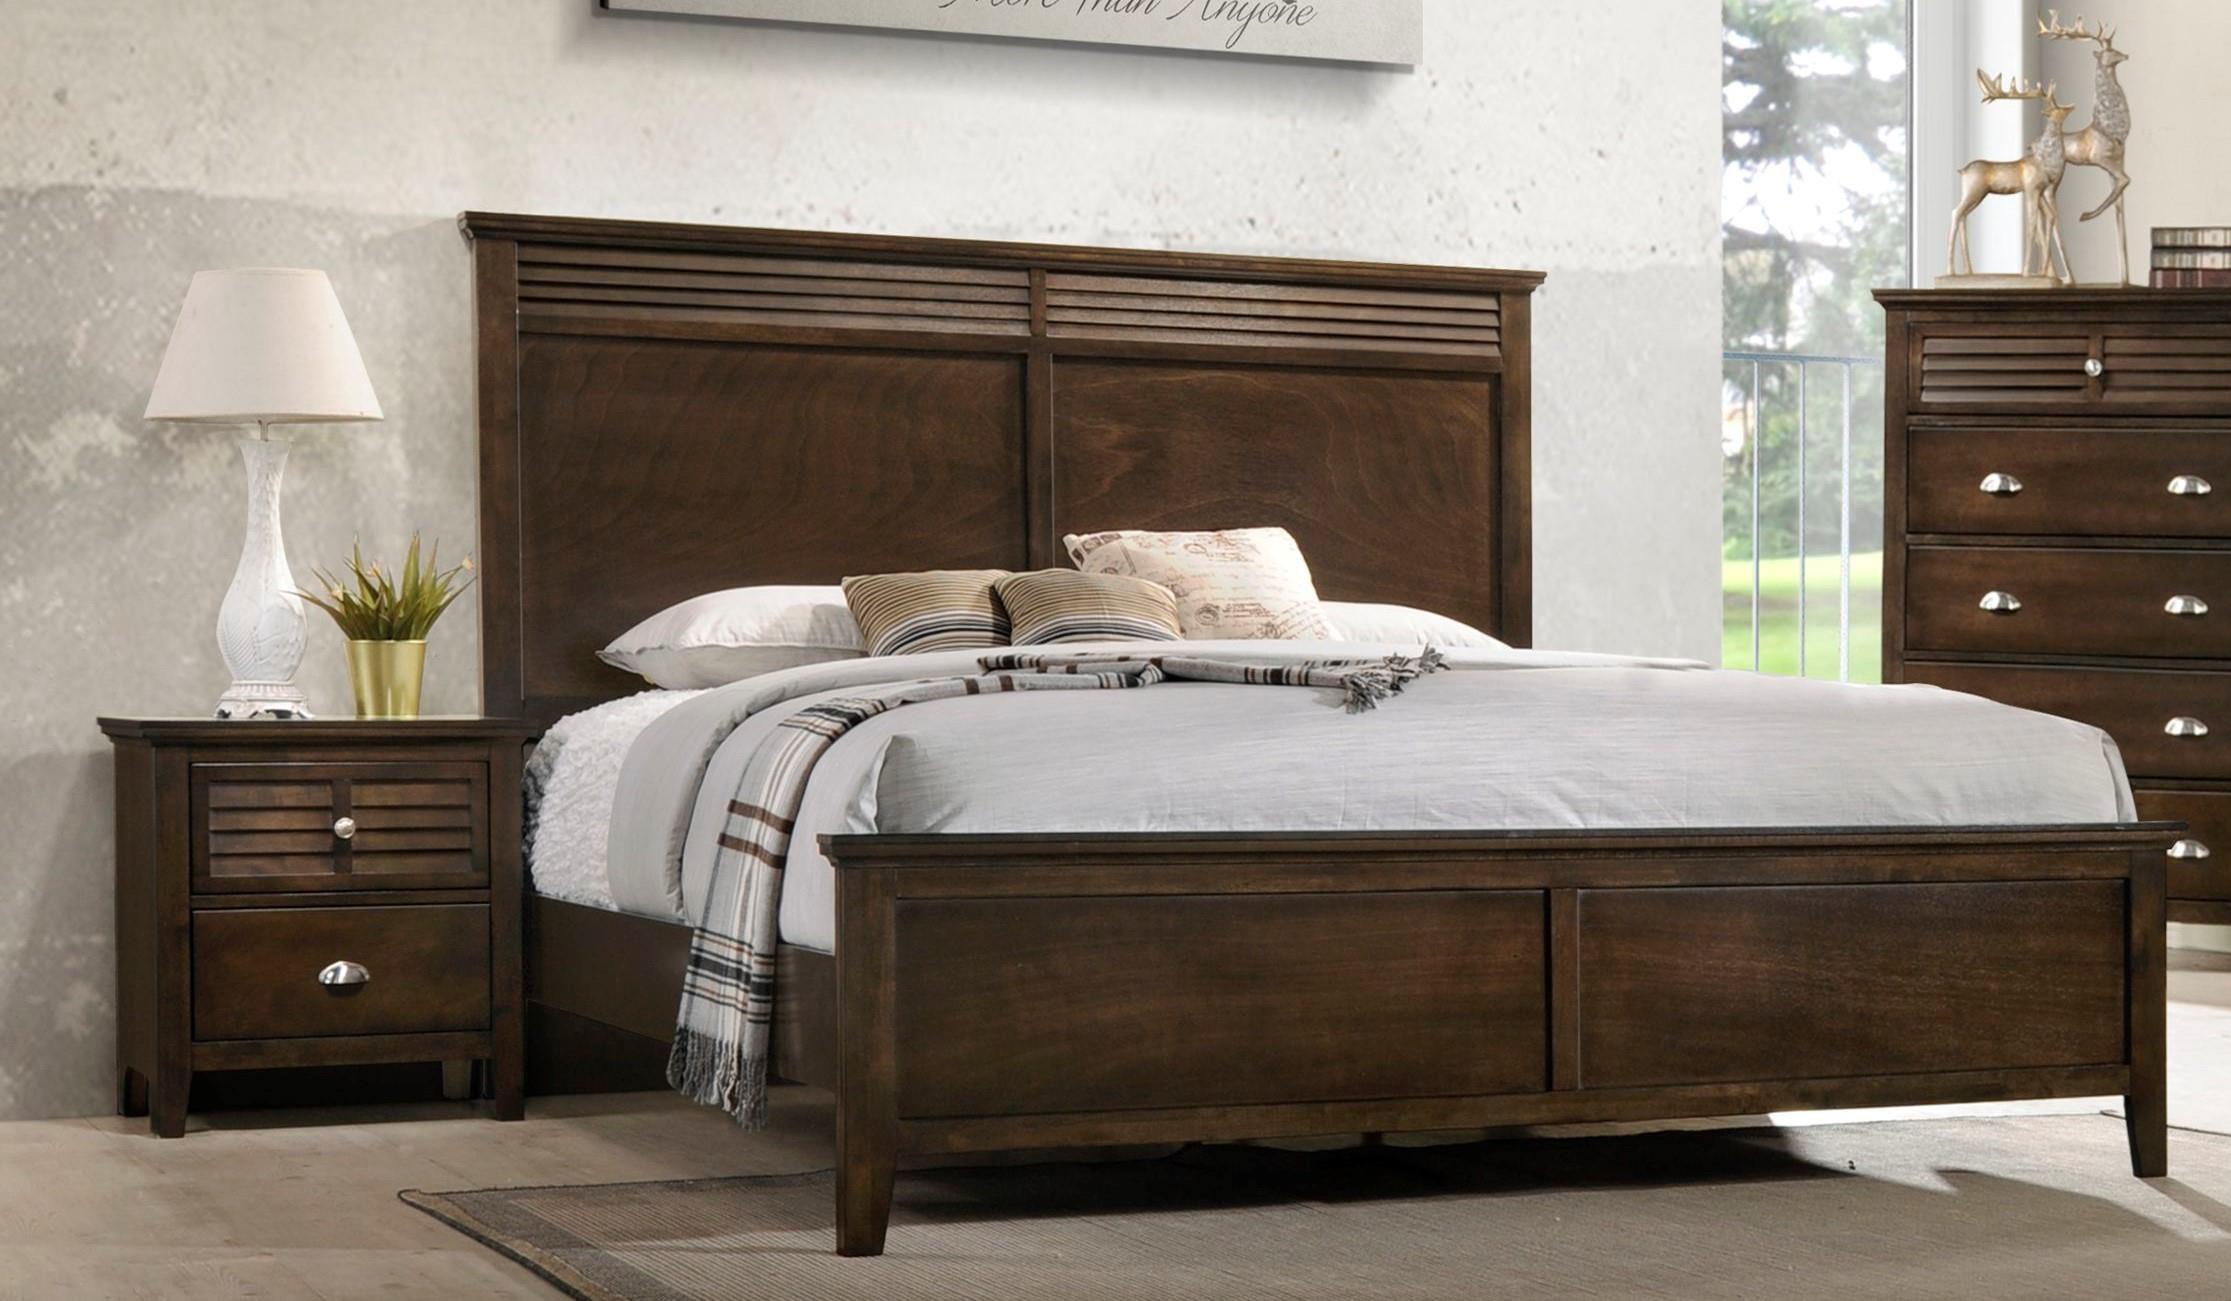 C7313 King Bed by Lifestyle at Furniture Fair - North Carolina